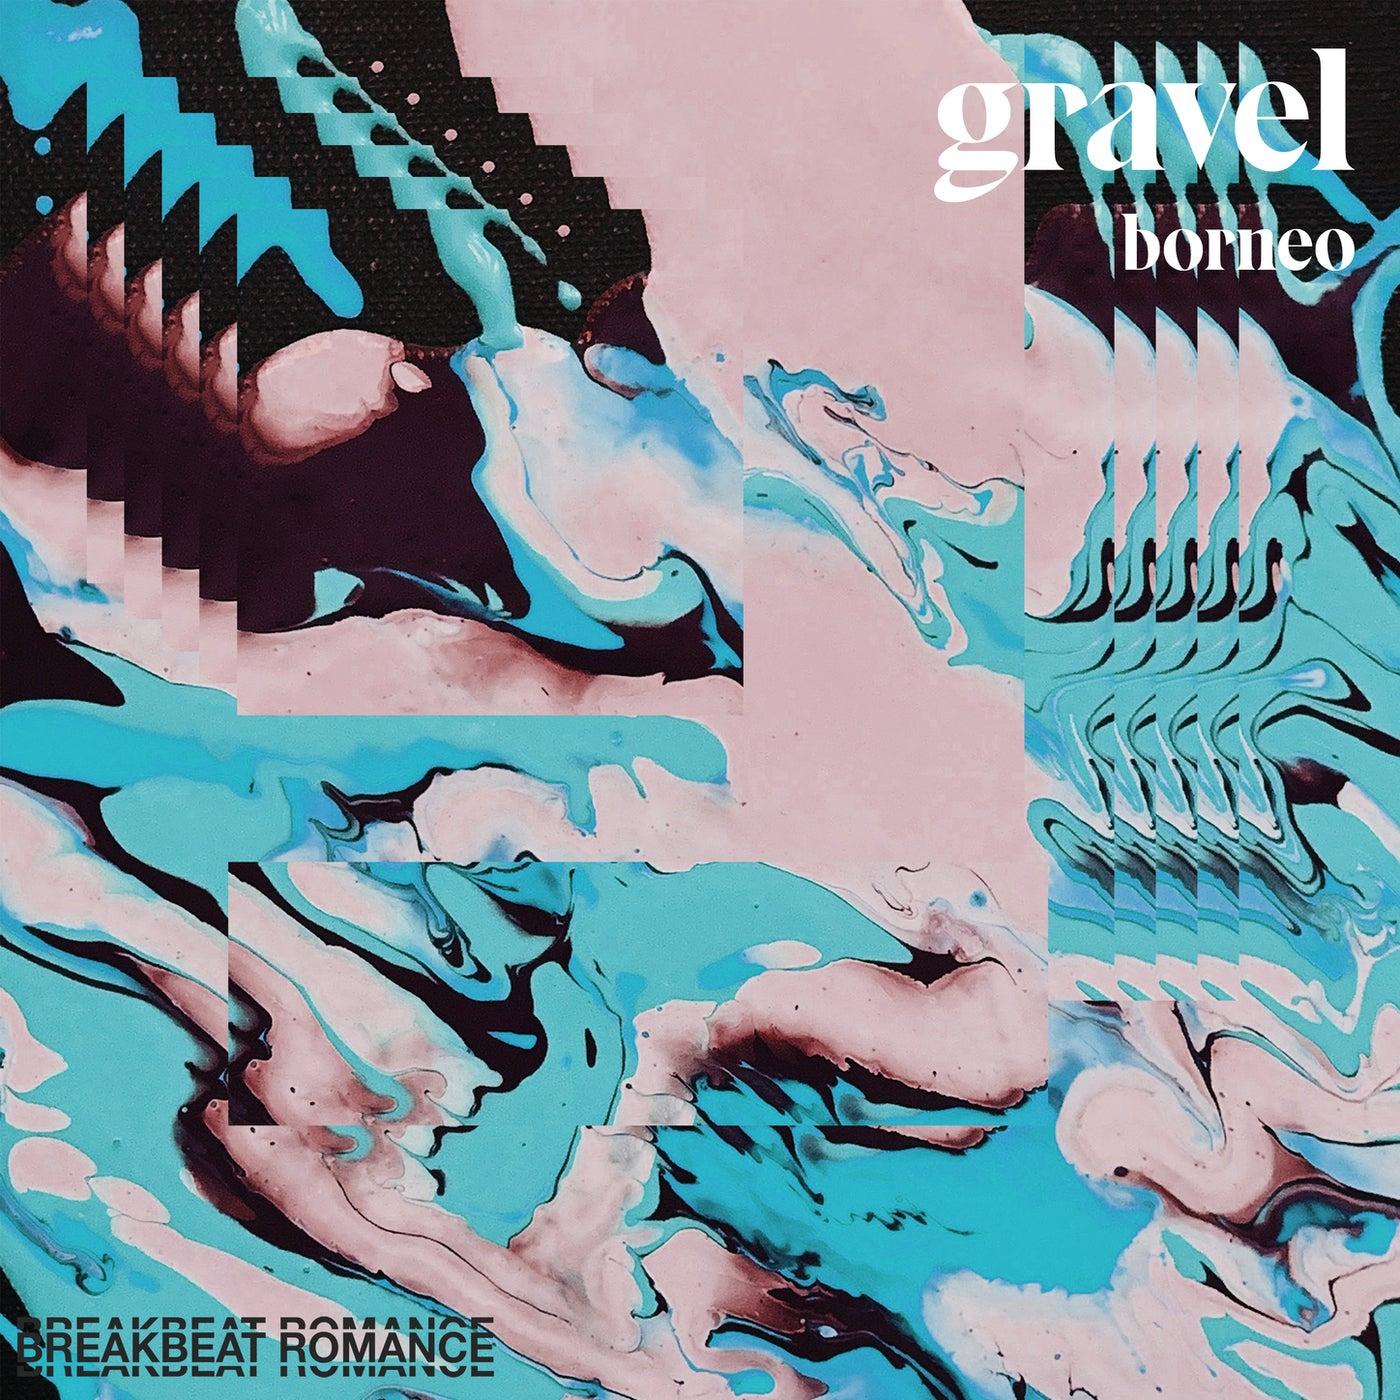 Gravel (Original Mix)